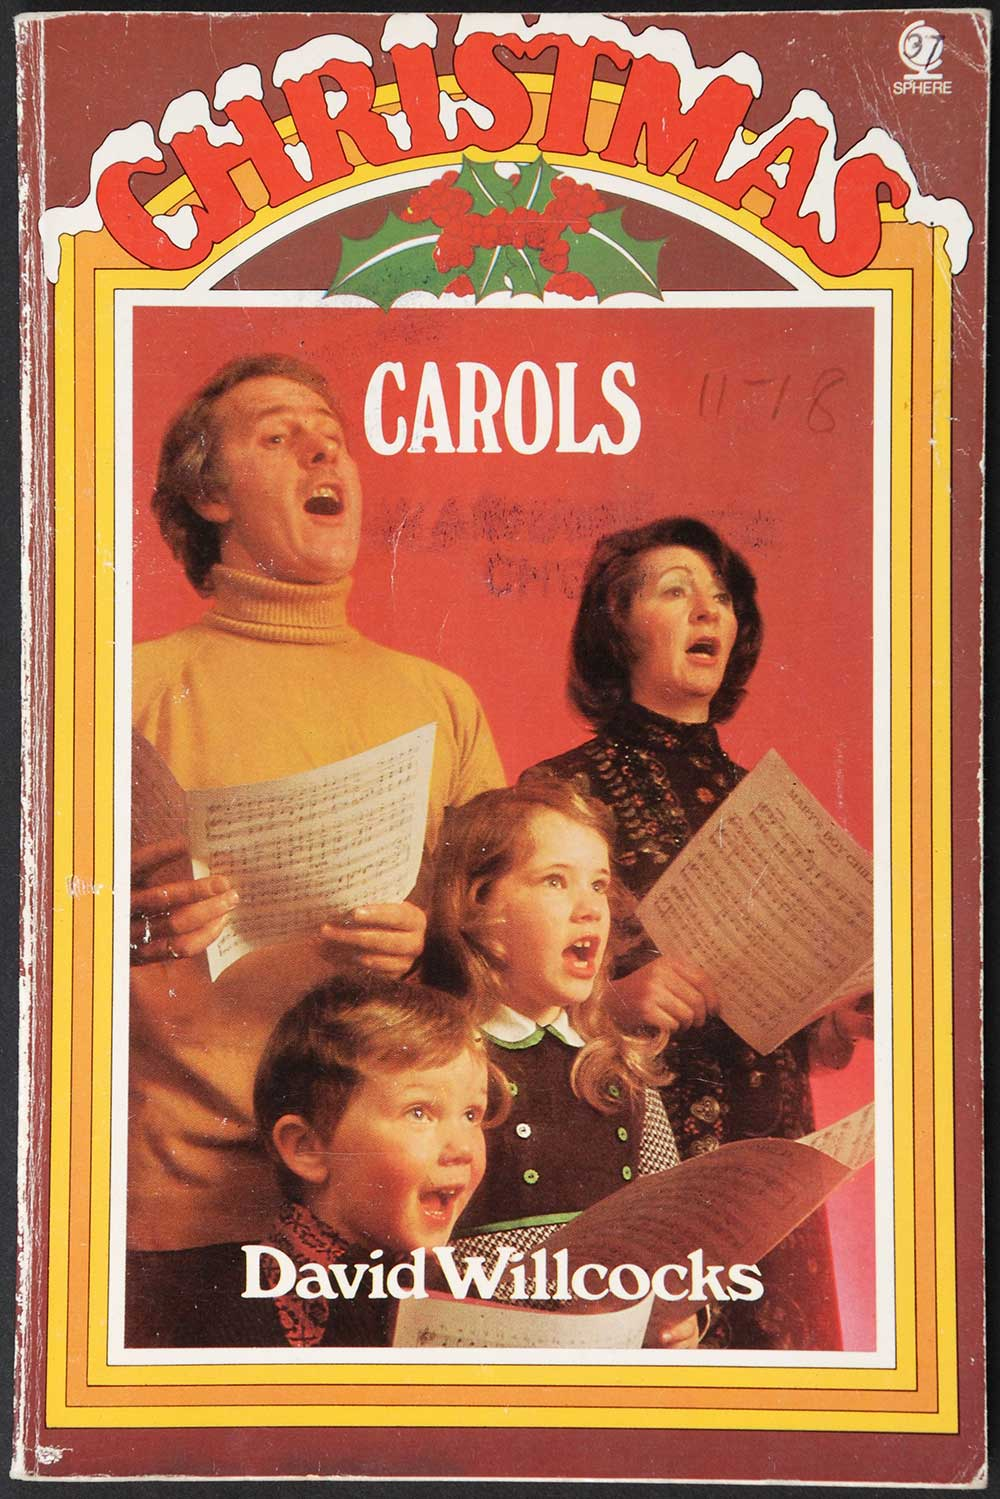 David Willcocks. <em>Christmas carols.</em> London: Sphere Books, 1975.